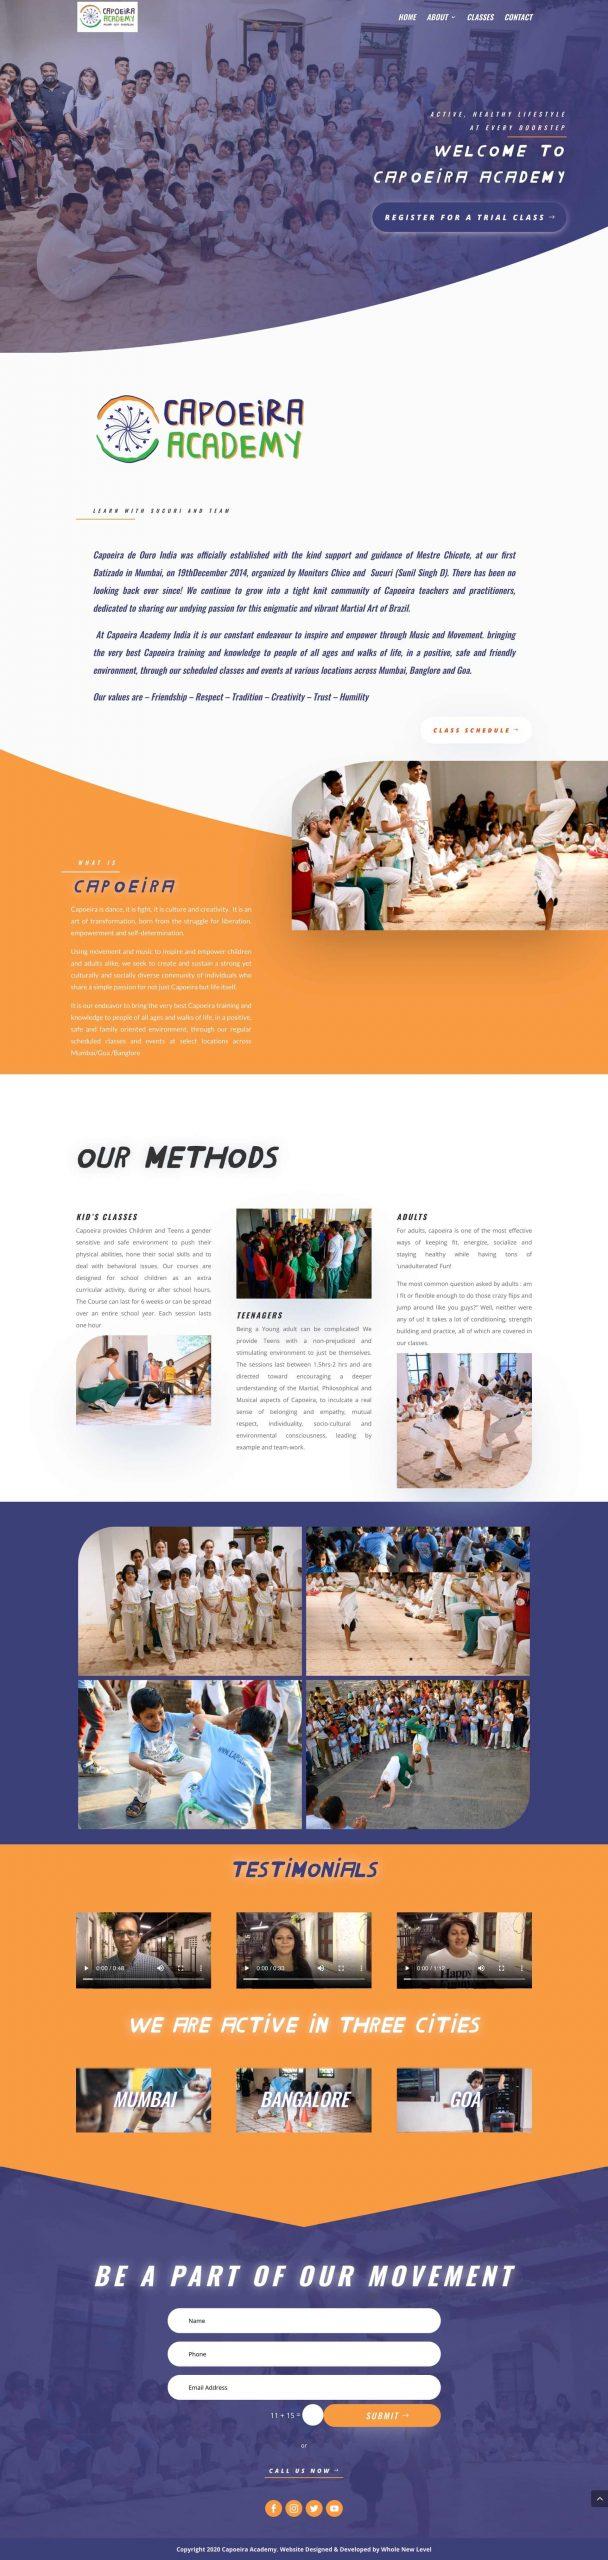 capoeira academy homepage